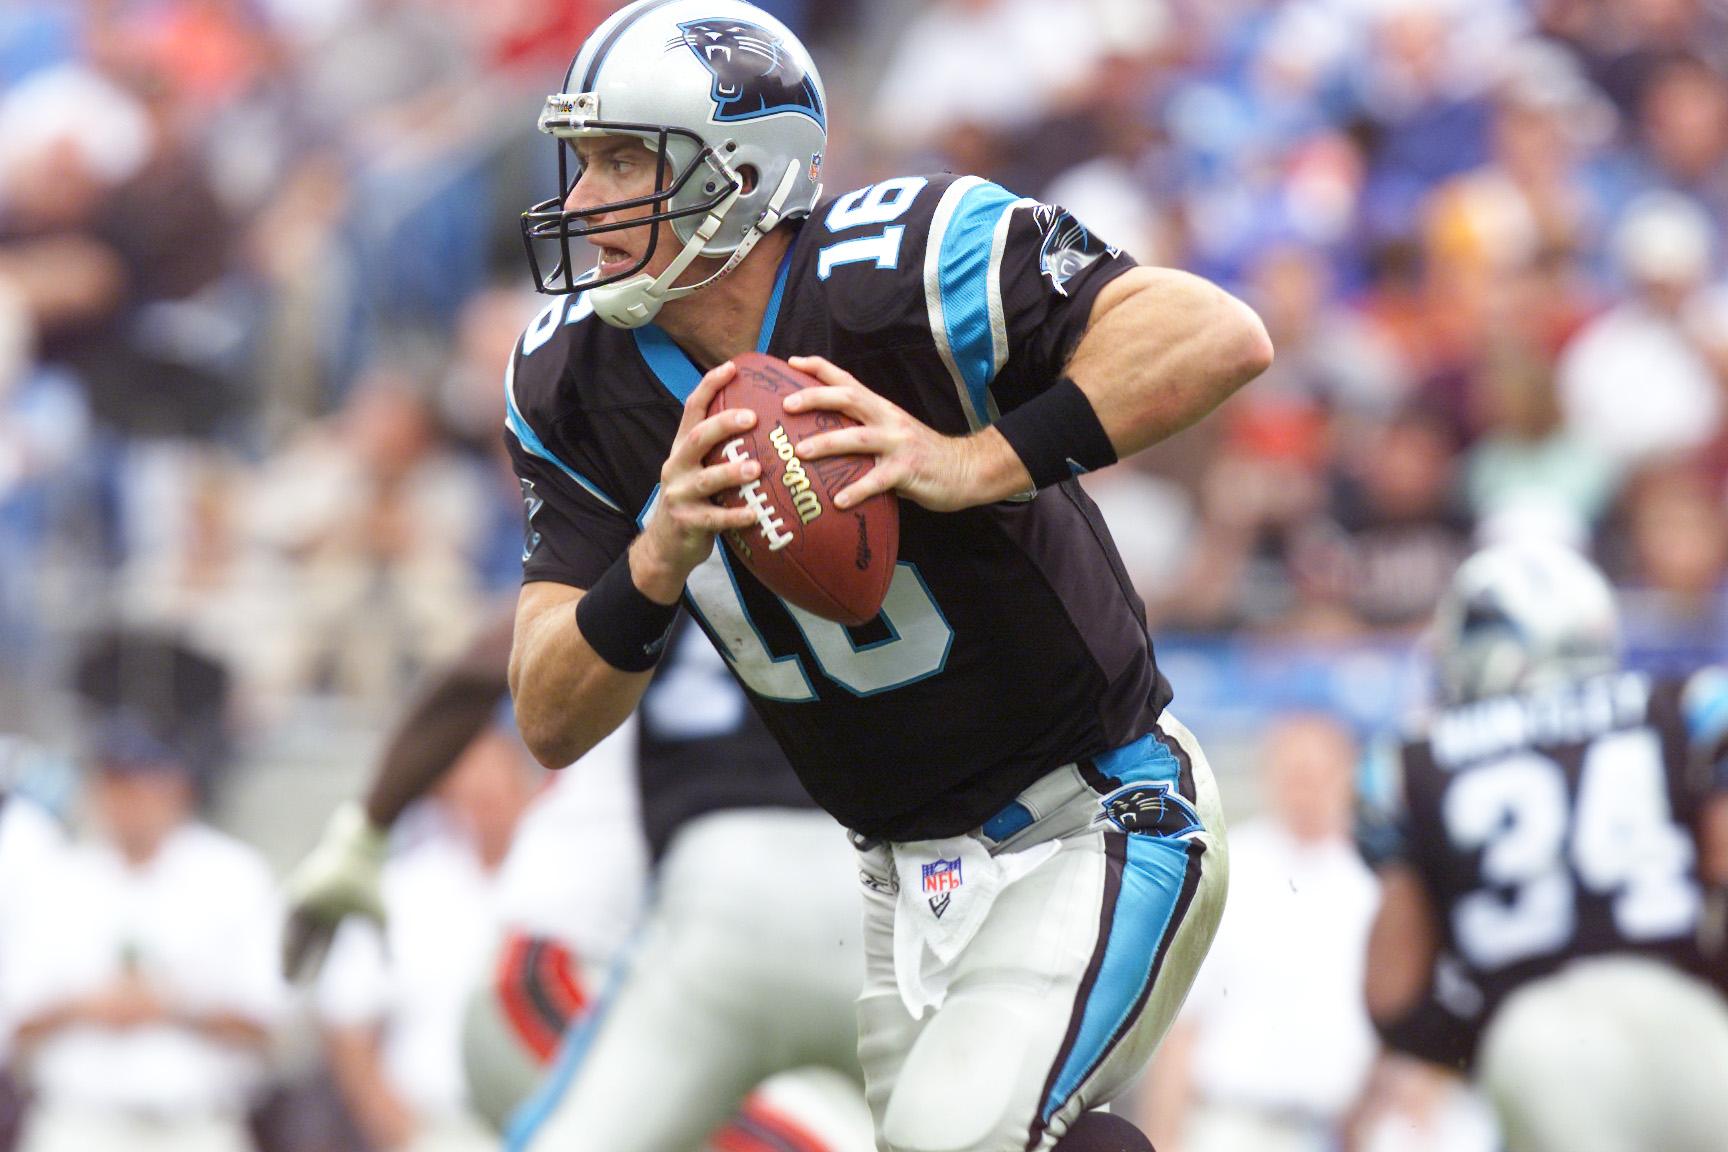 25 Nov 2001 : Chris Weinke of the Carolina Panthers runs with the ball against the Atlanta Falcons during the game at Ericsson Stadium in Charlotte, North Carolina. The Falcons won 10-7. DIGITAL IMAGE. Mandatory Credit: Craig Jones/Allsport